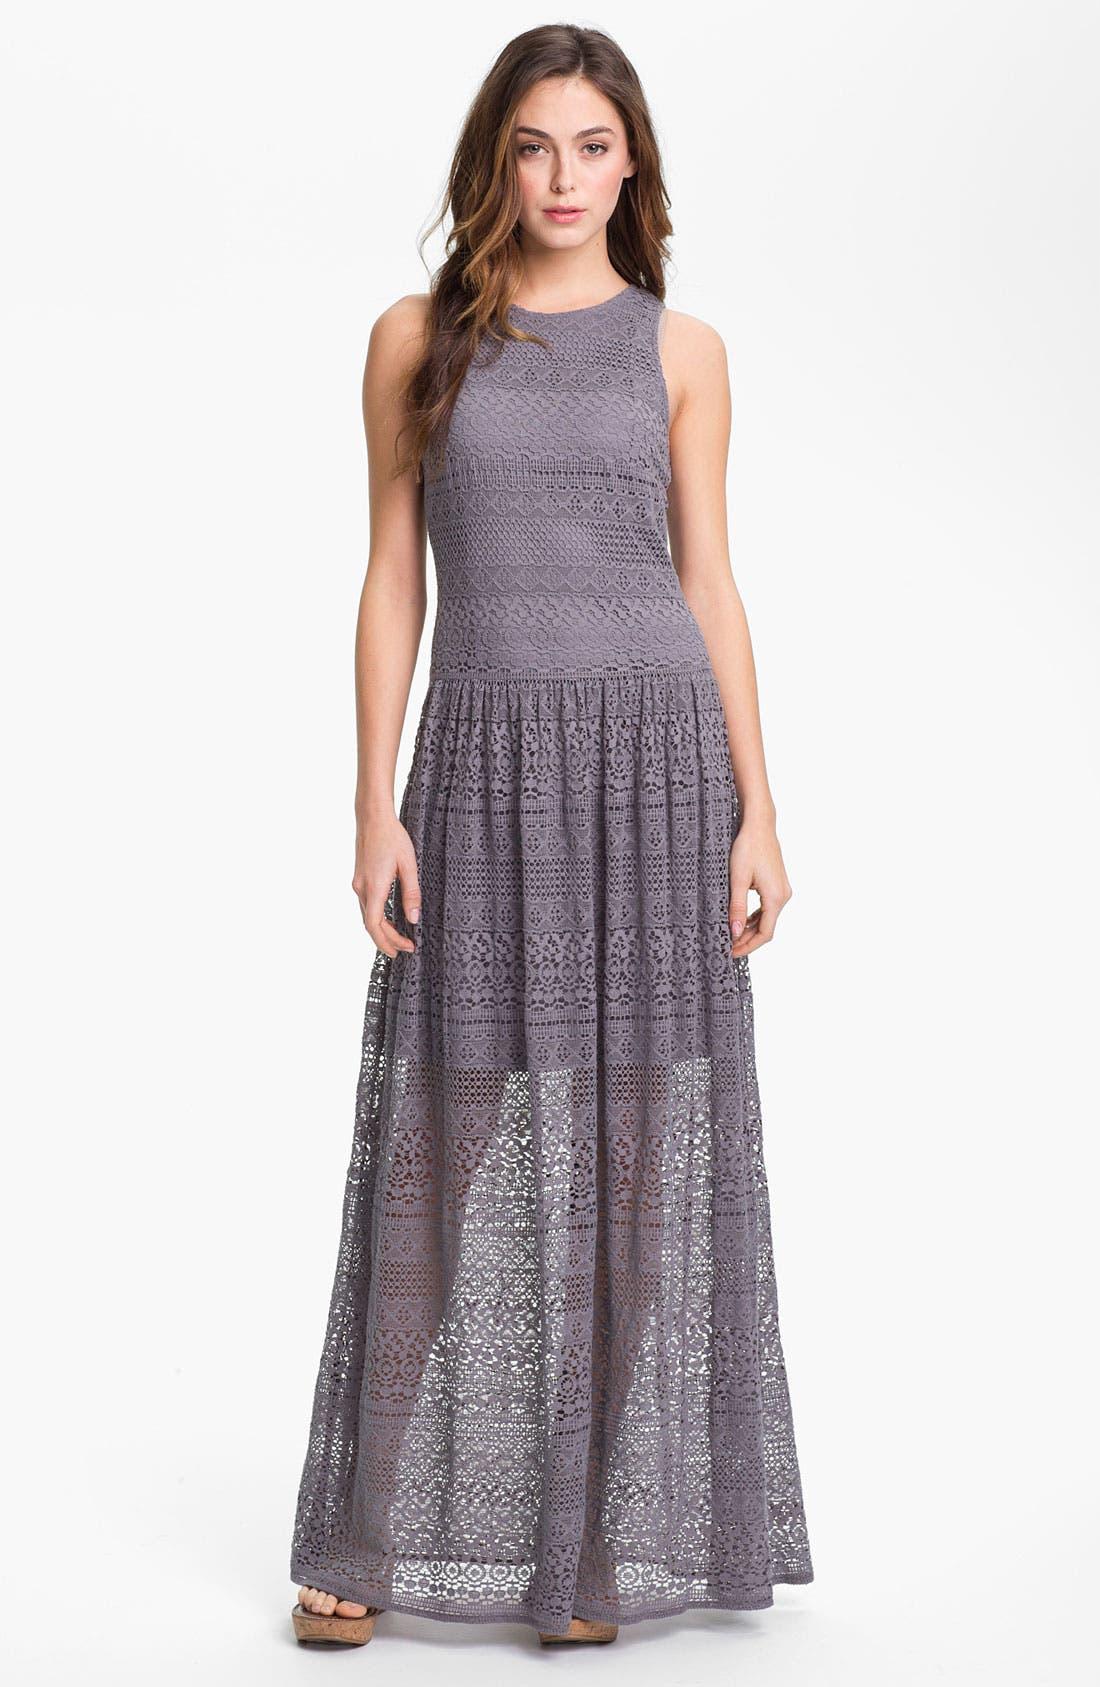 Main Image - Suzi Chin for Maggy Boutique Crochet Maxi Dress